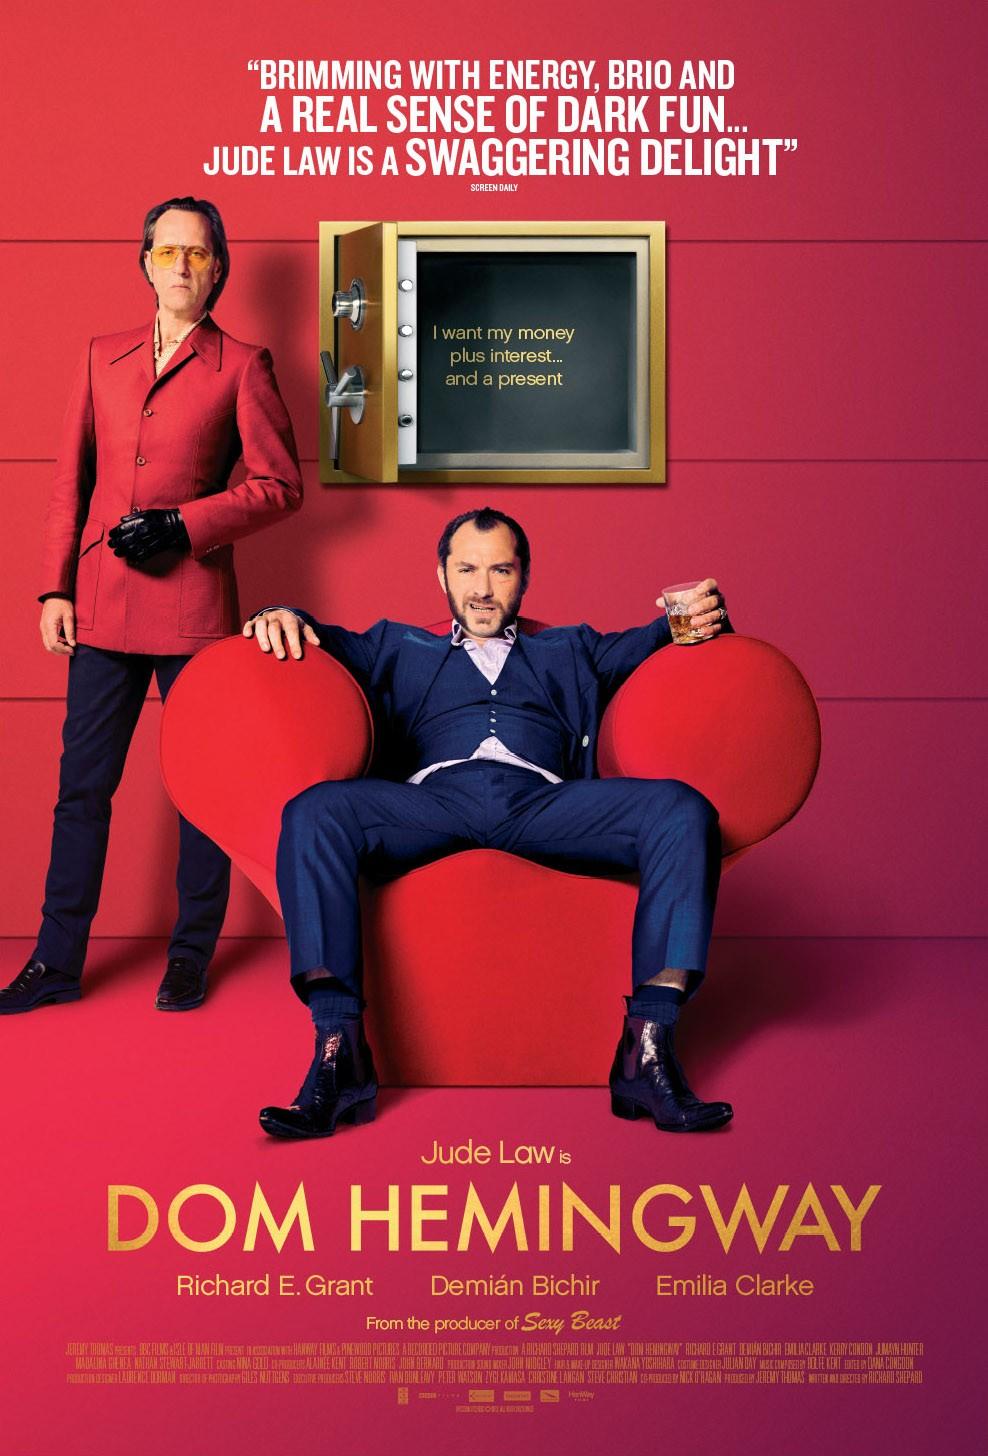 dom-hemingway-poster04.jpg